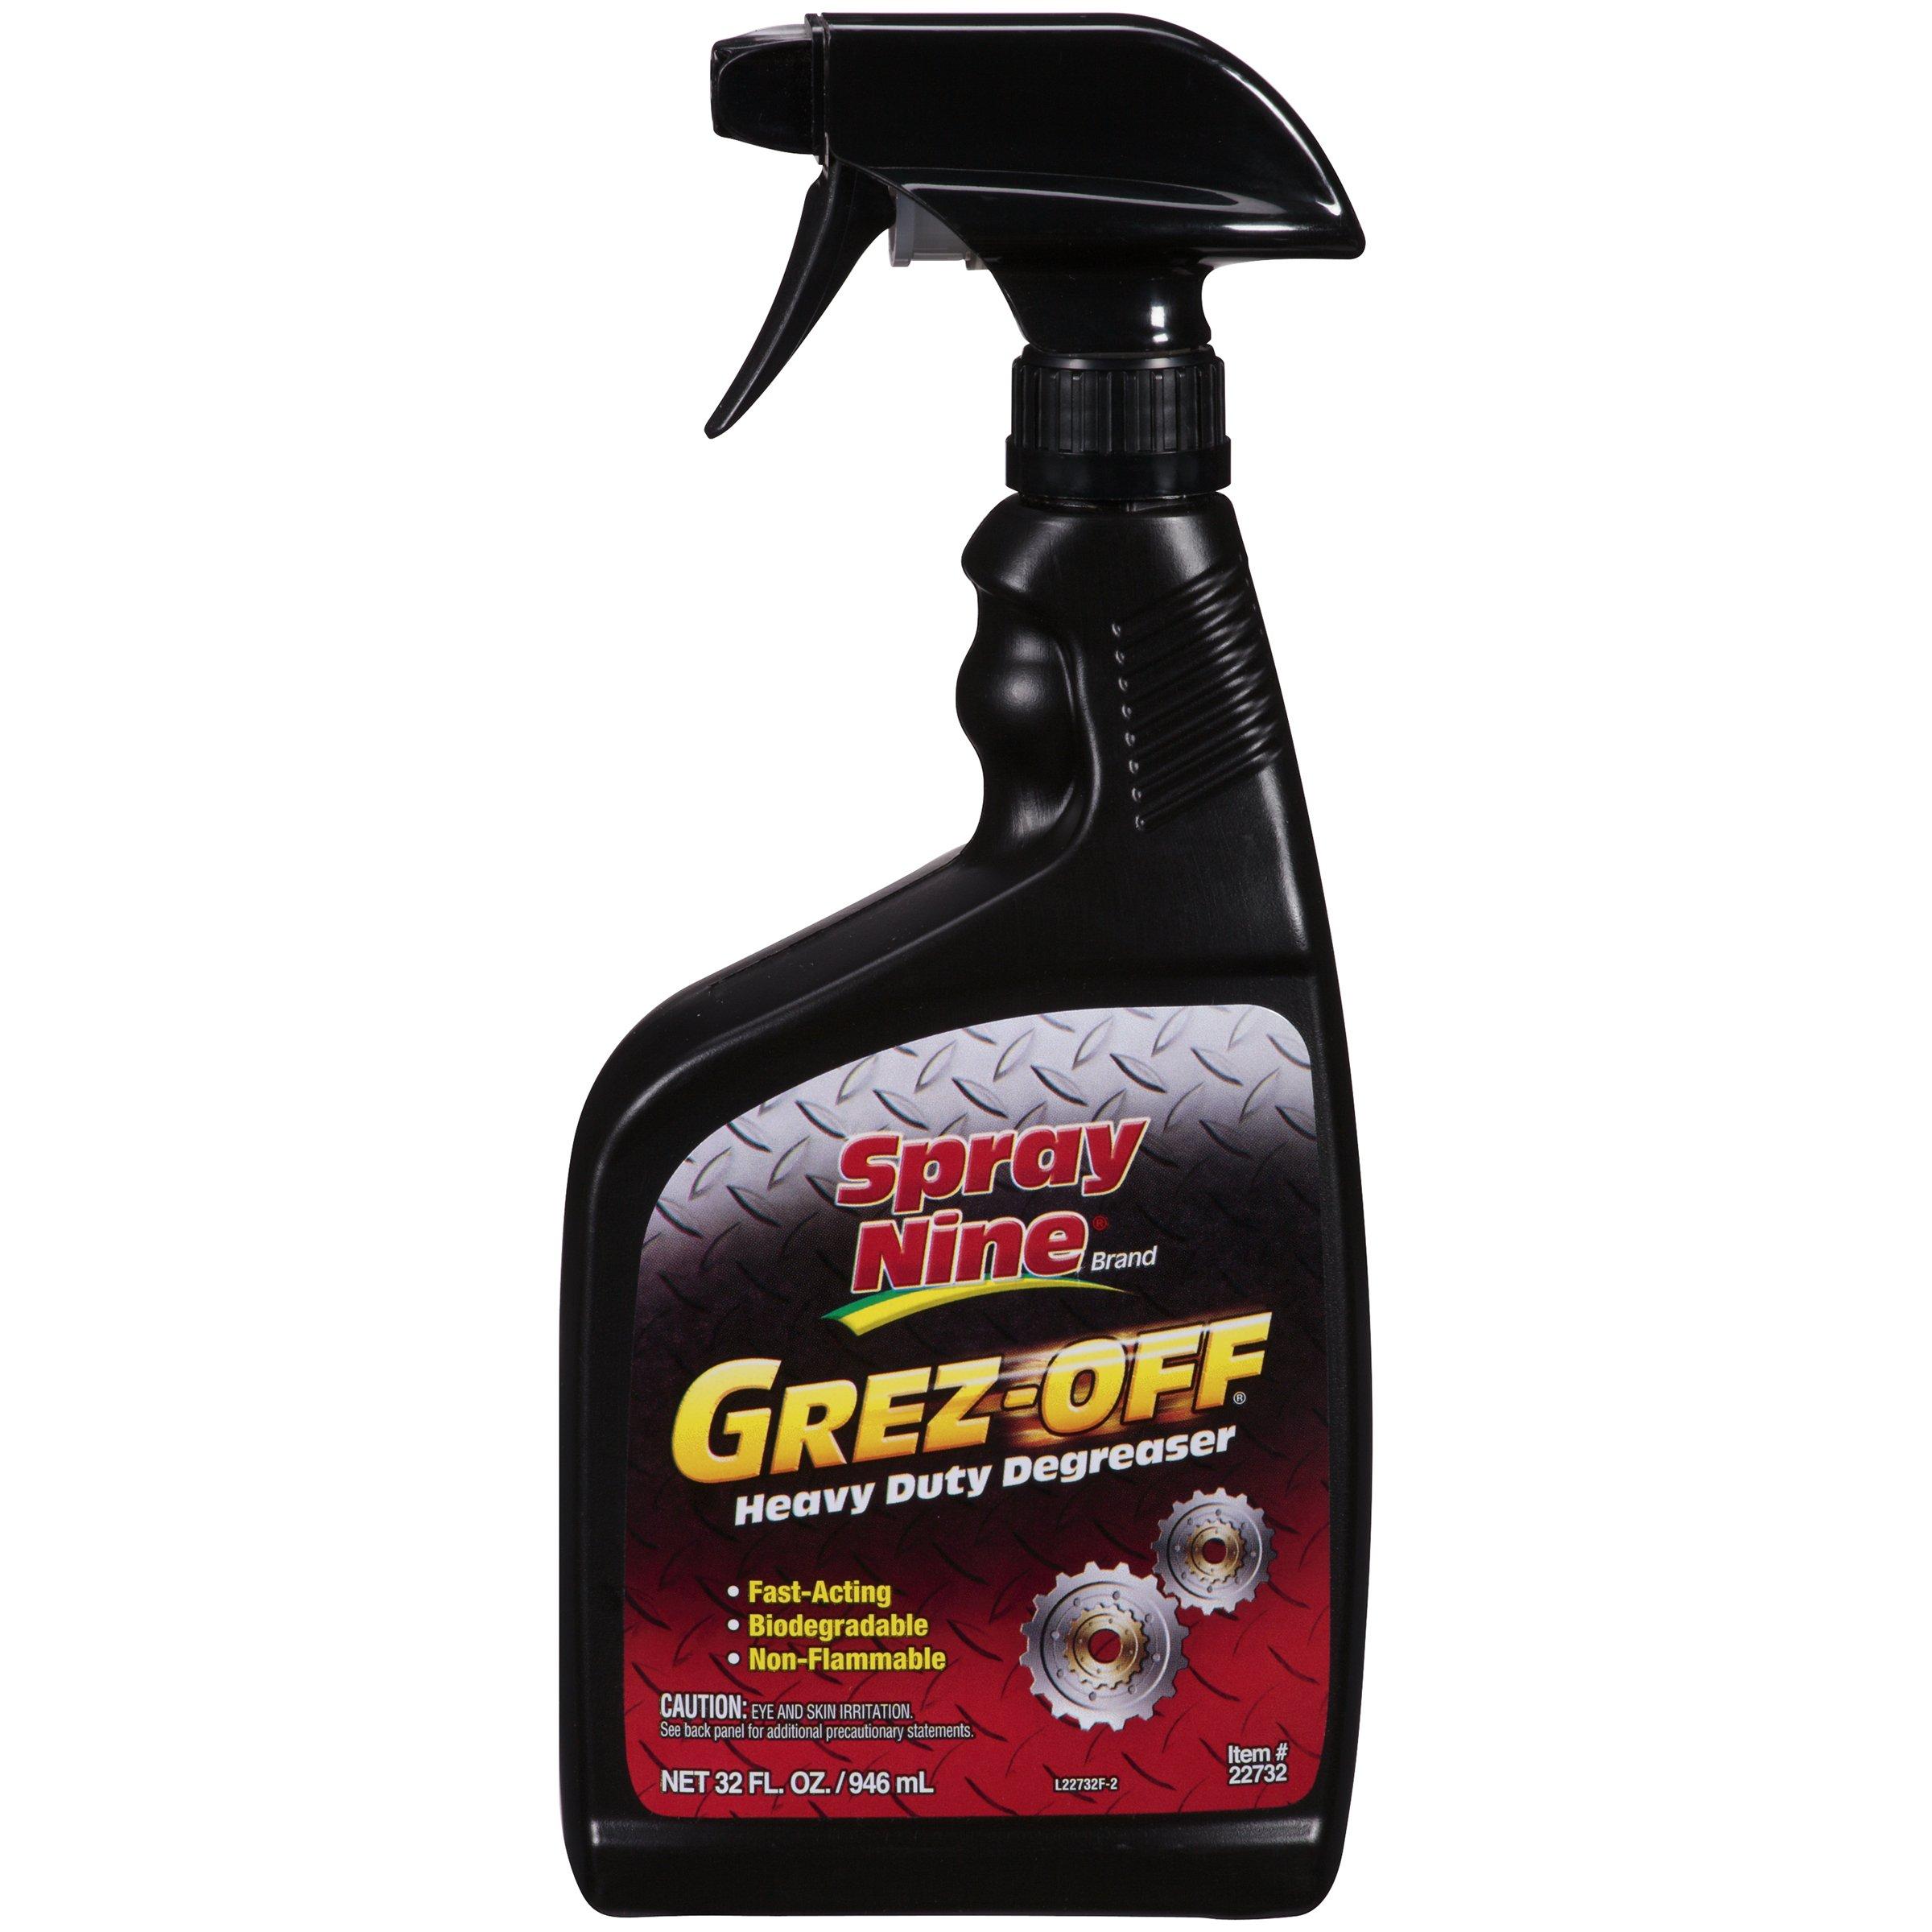 Spray Nine 22732 Grez-Off Heavy Duty Degreaser, 32 oz. product image